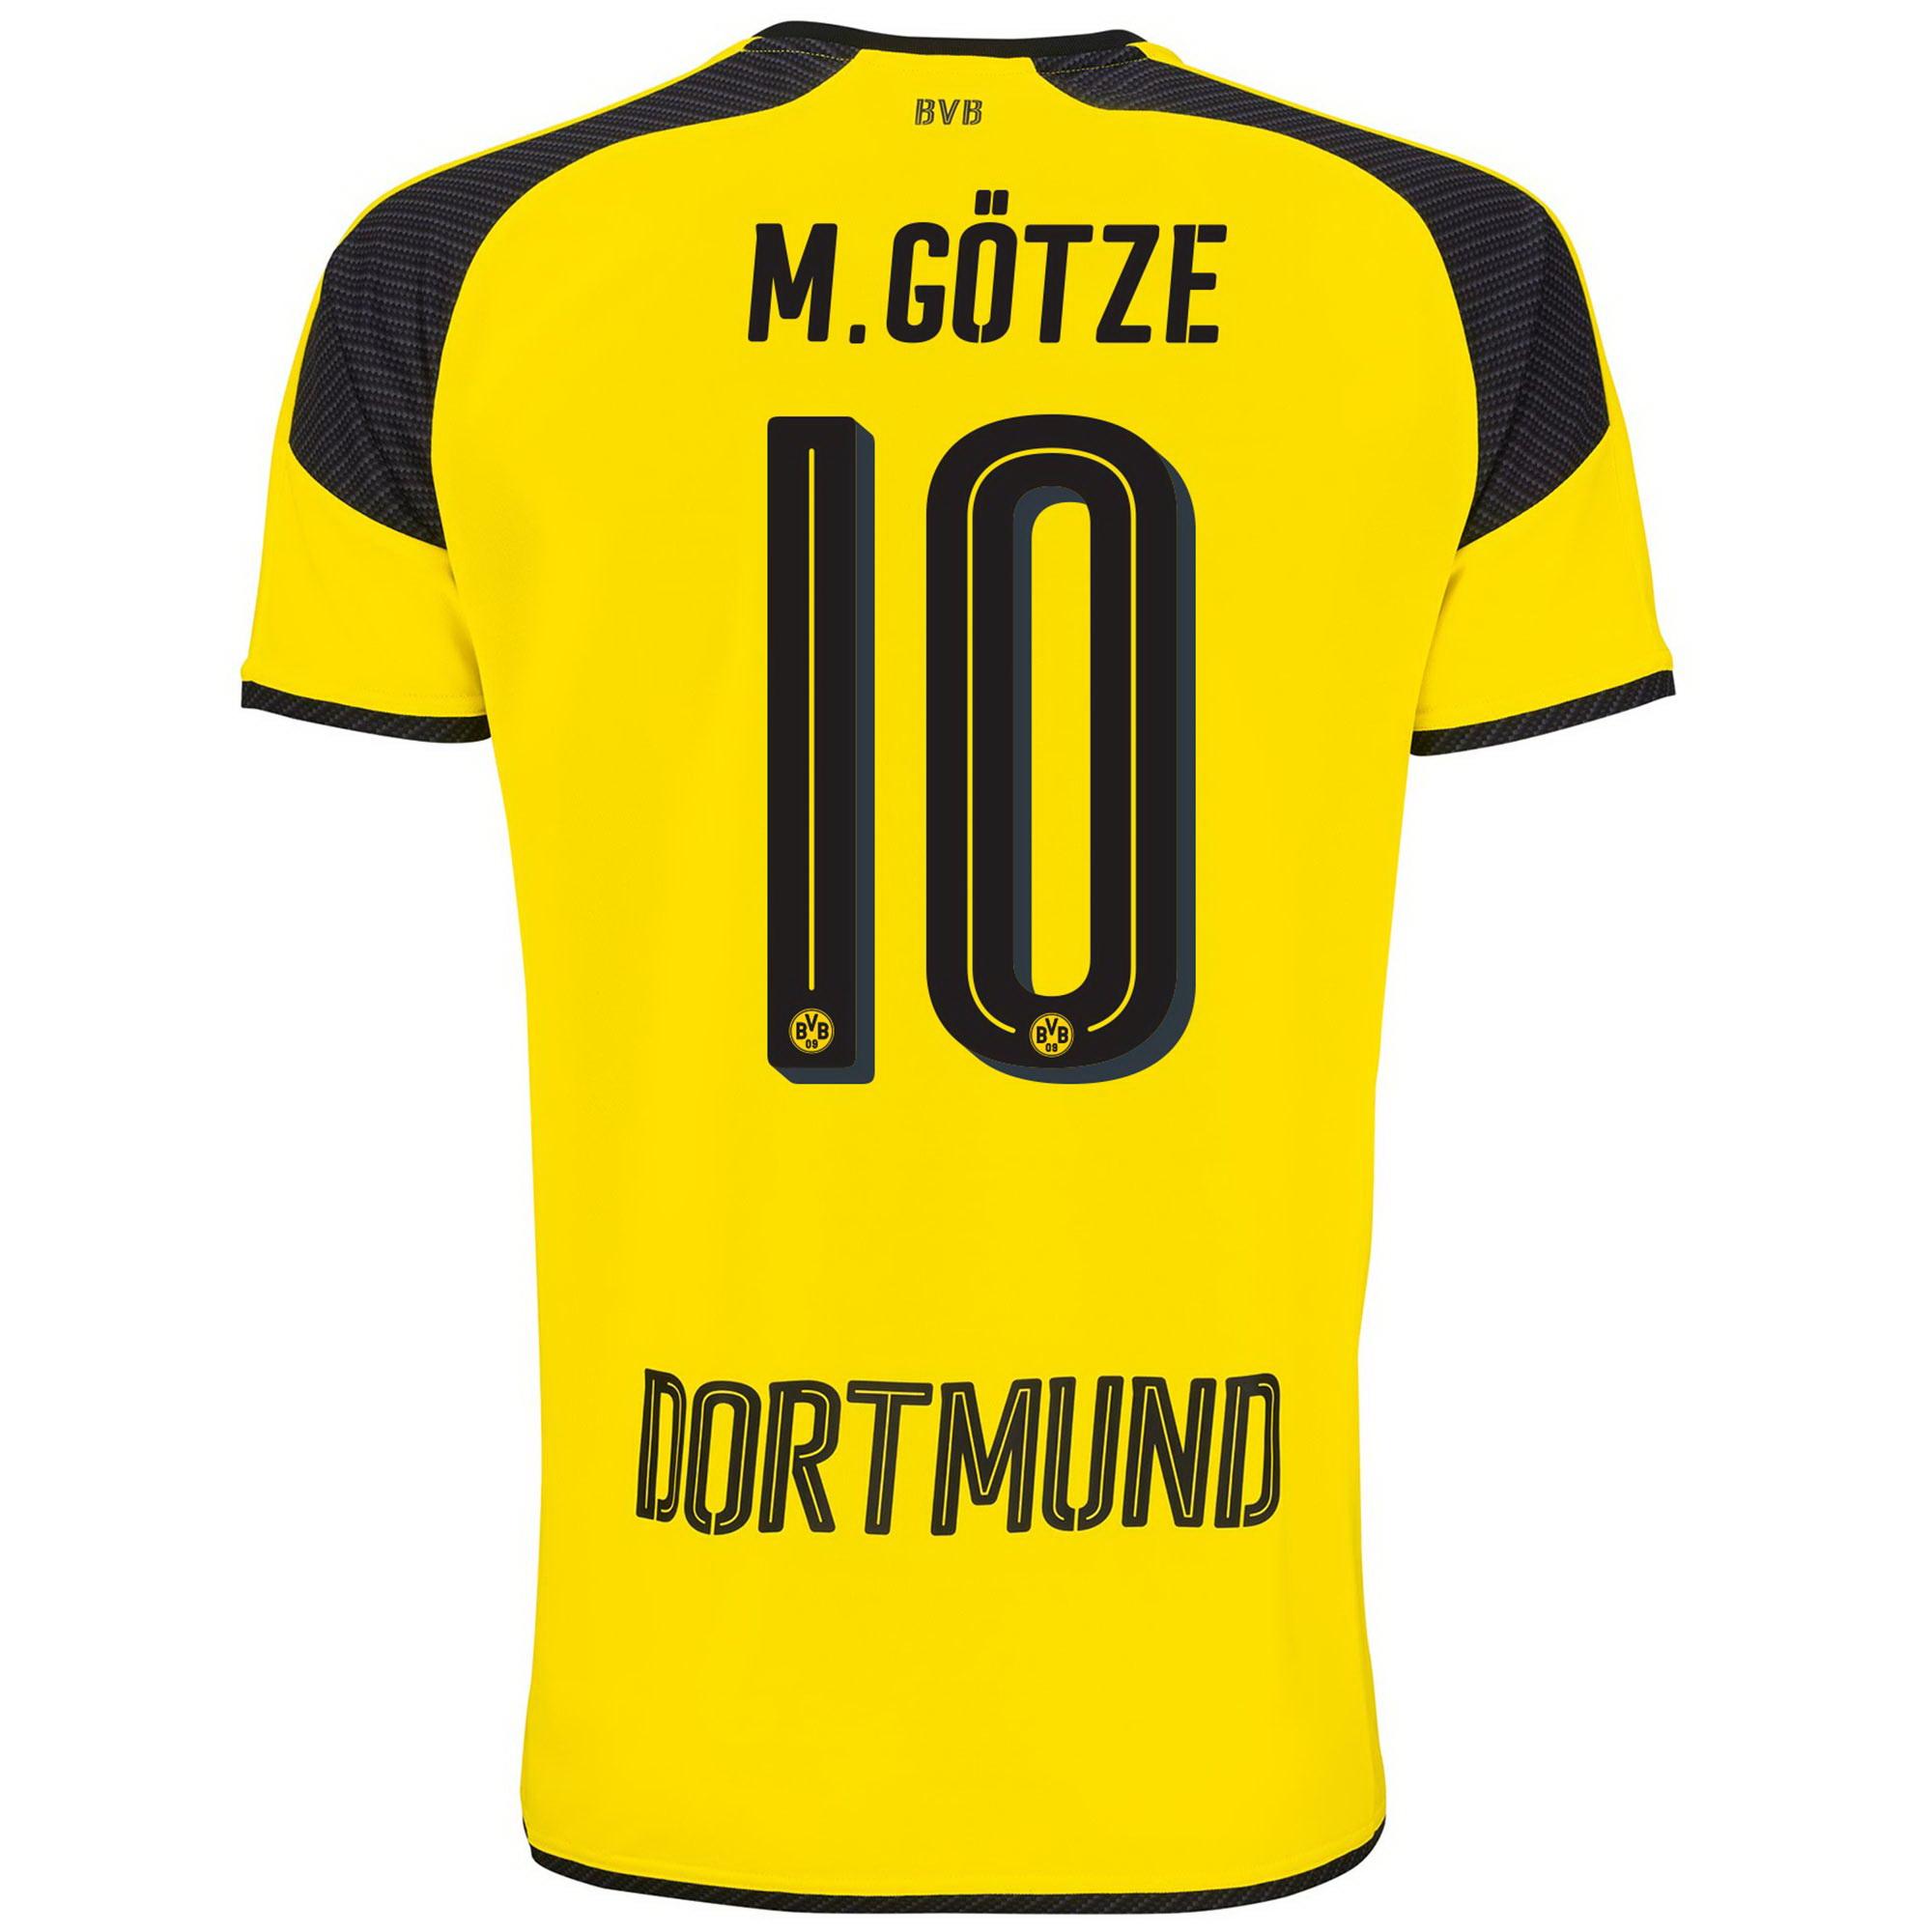 Image of BVB International Home Shirt 2016-17 - Outsize with M. Götze 10 printi, N/A